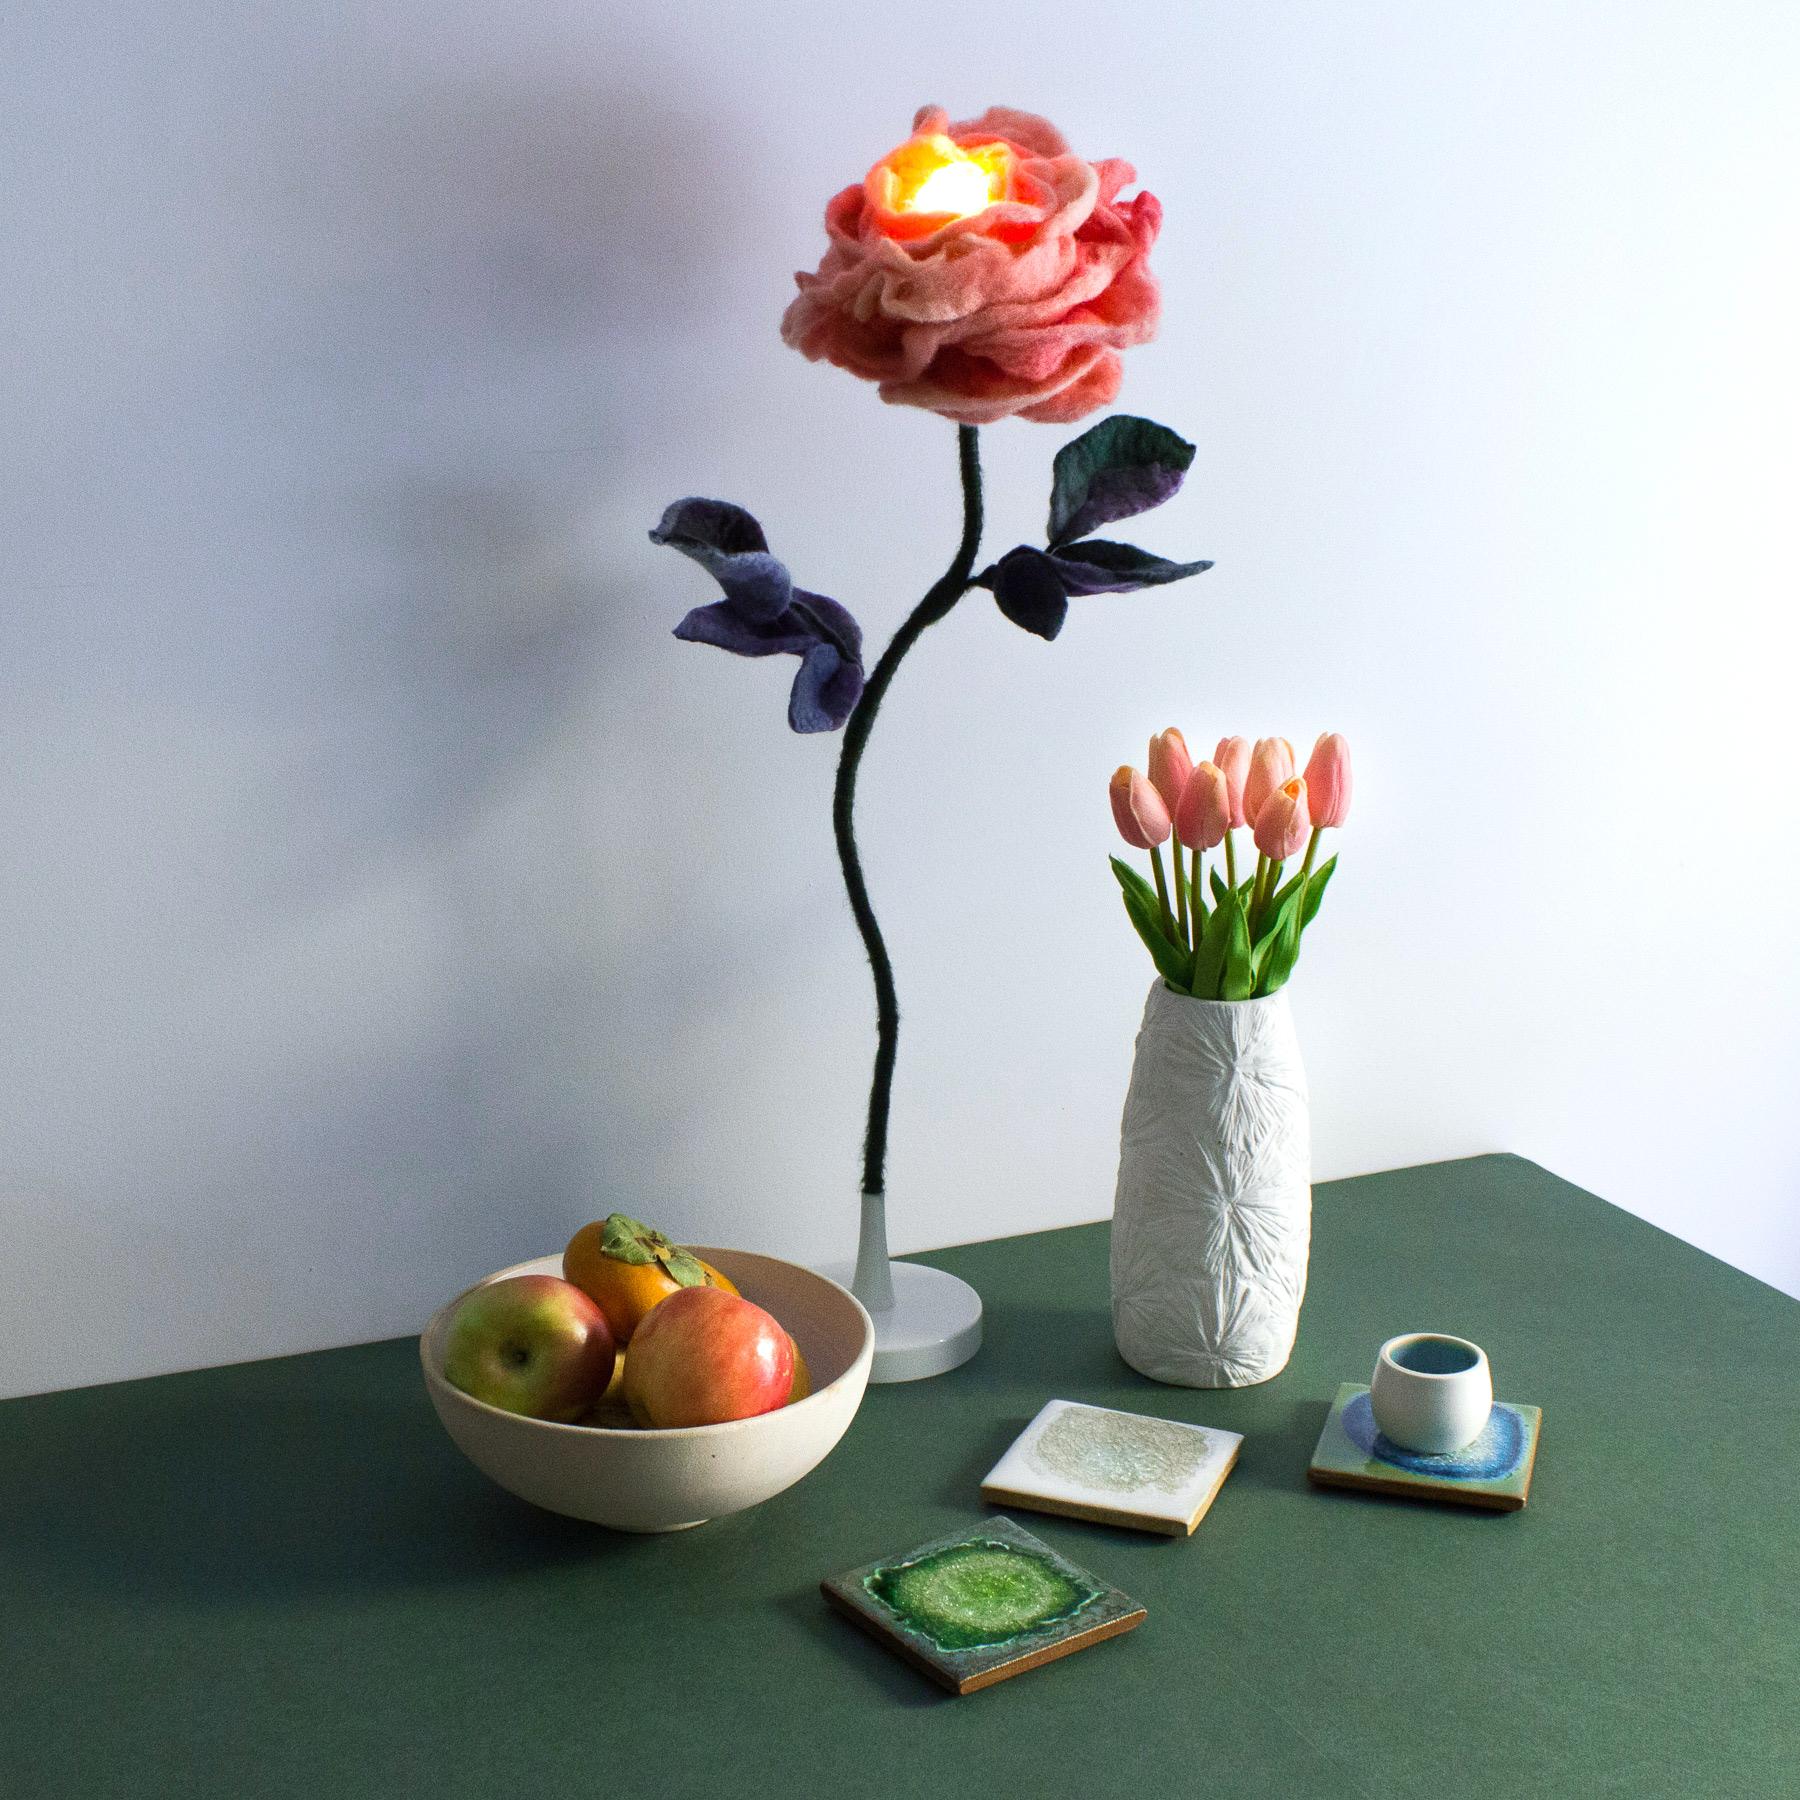 felt-flower-lamp_Peach_Adelya-Tumasyeva_6.jpg